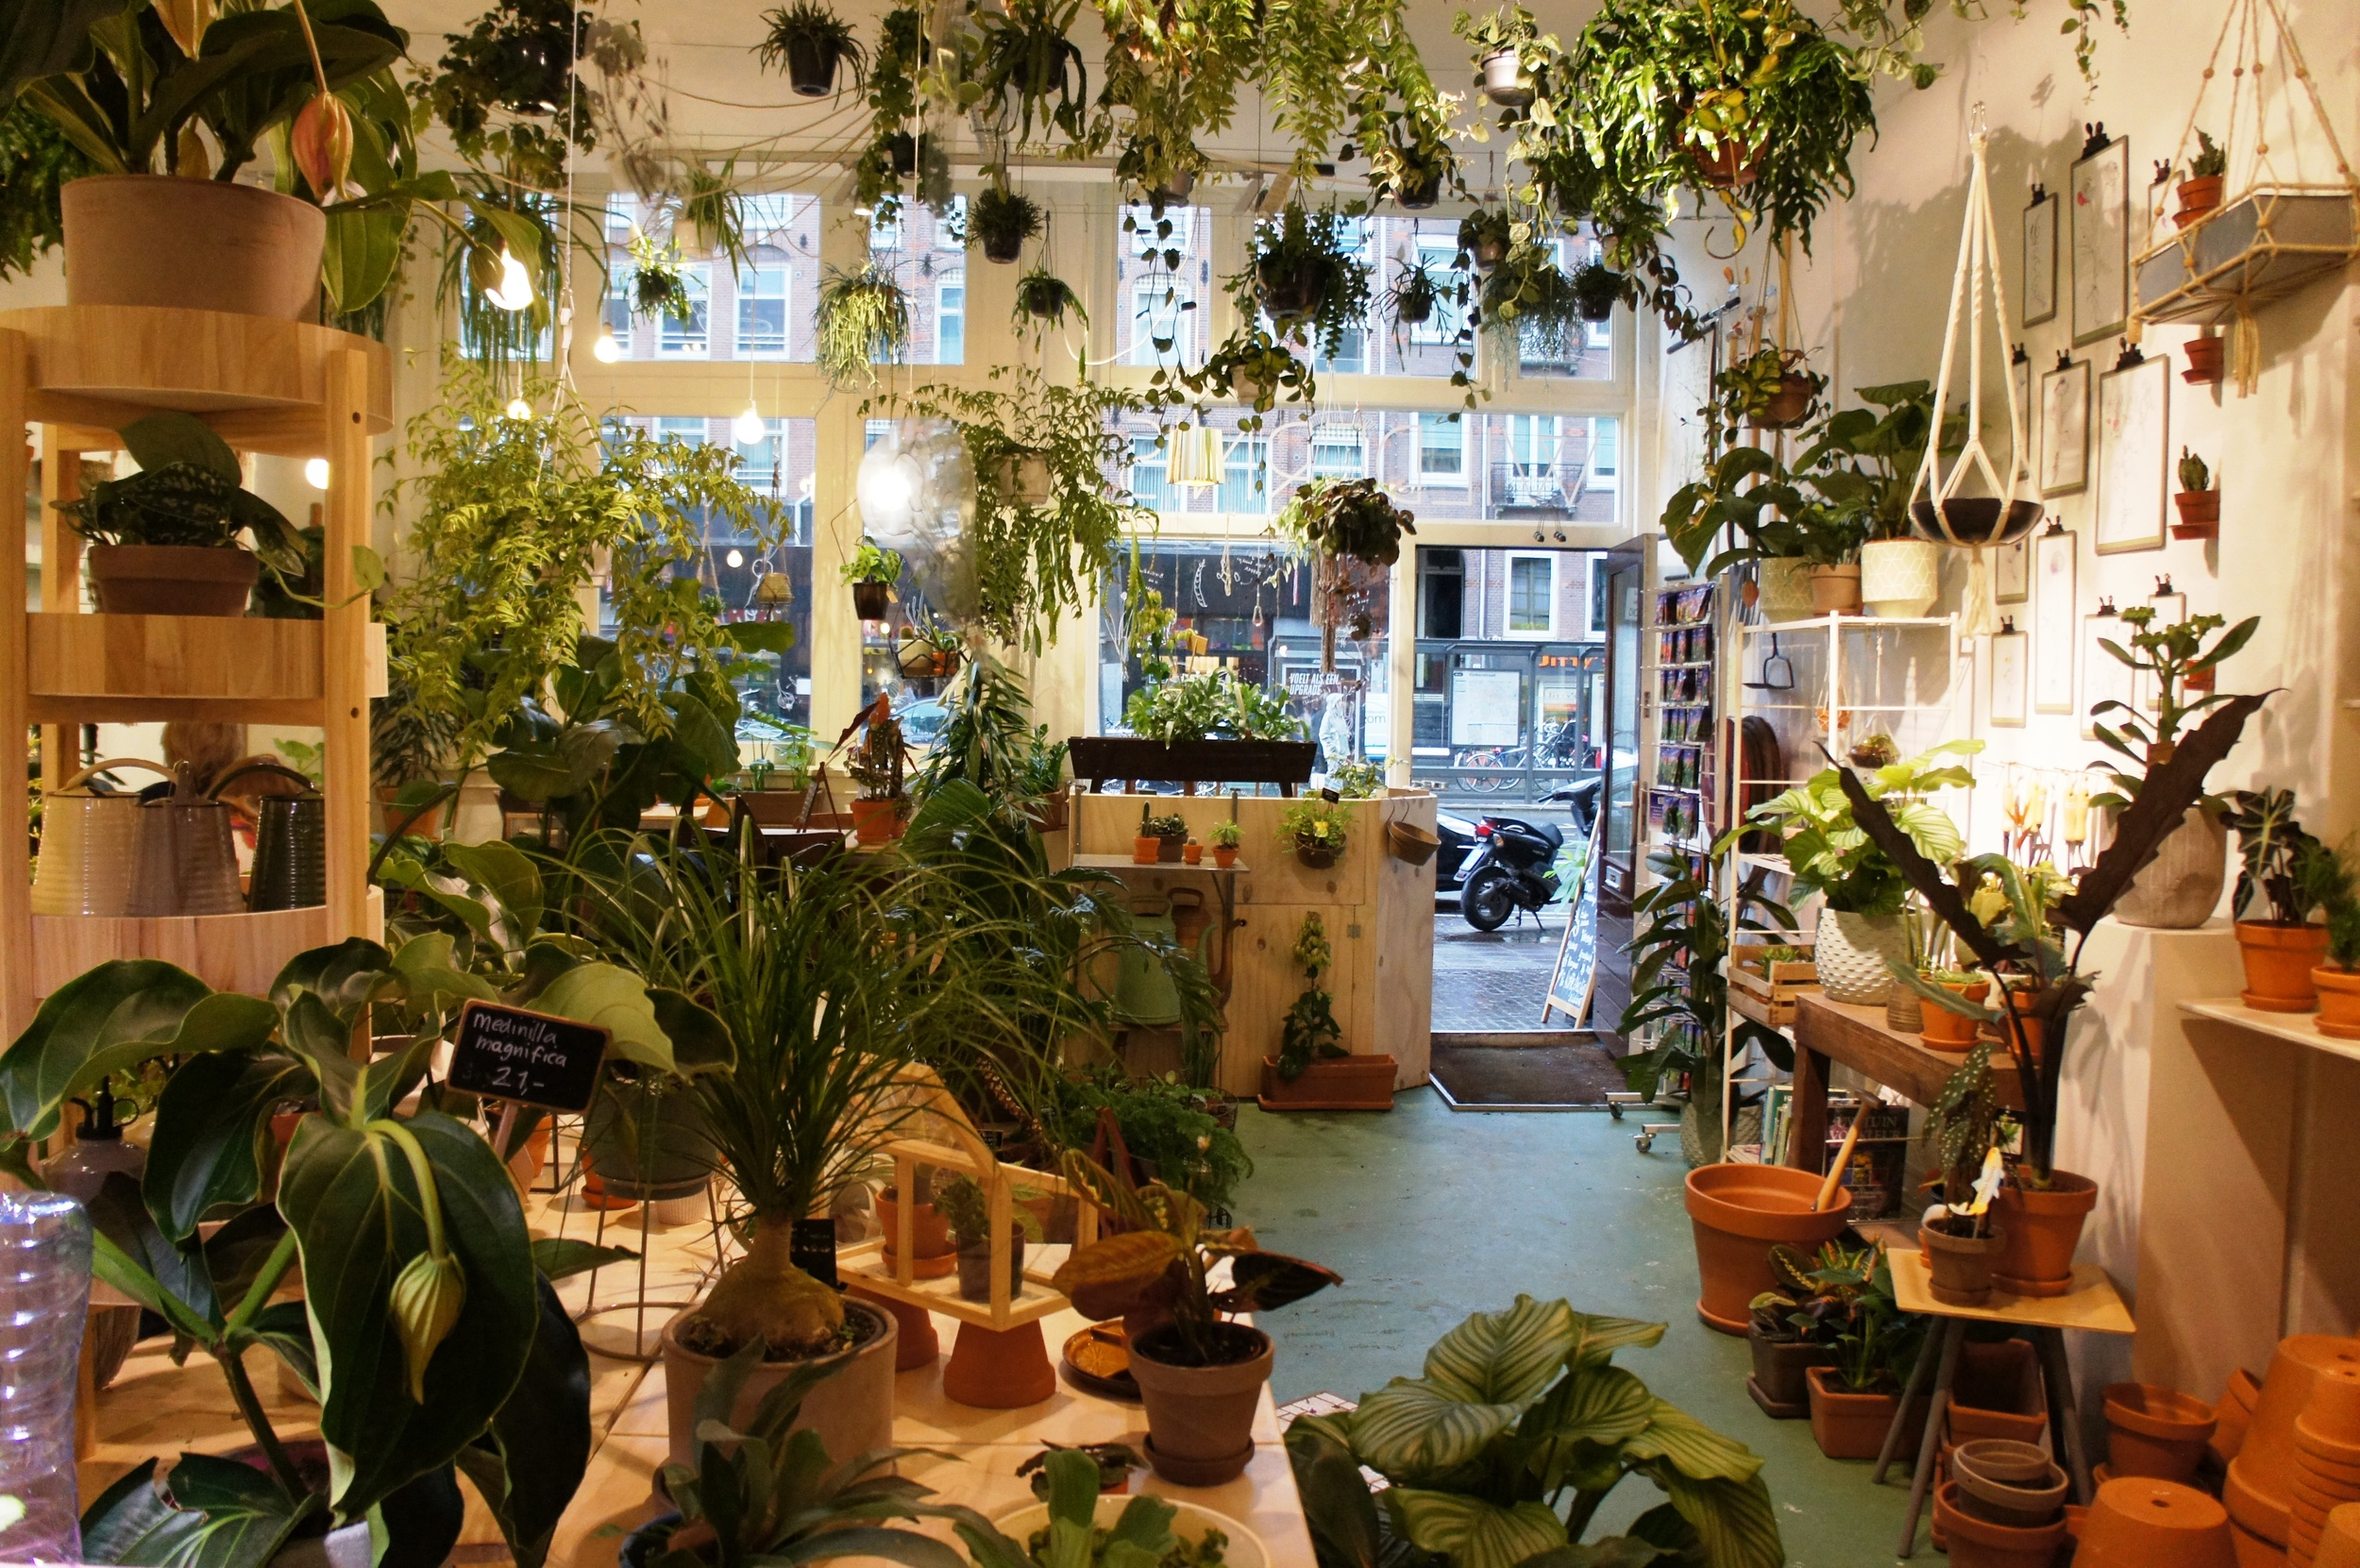 Wildernis plant shop interior Amsterdam